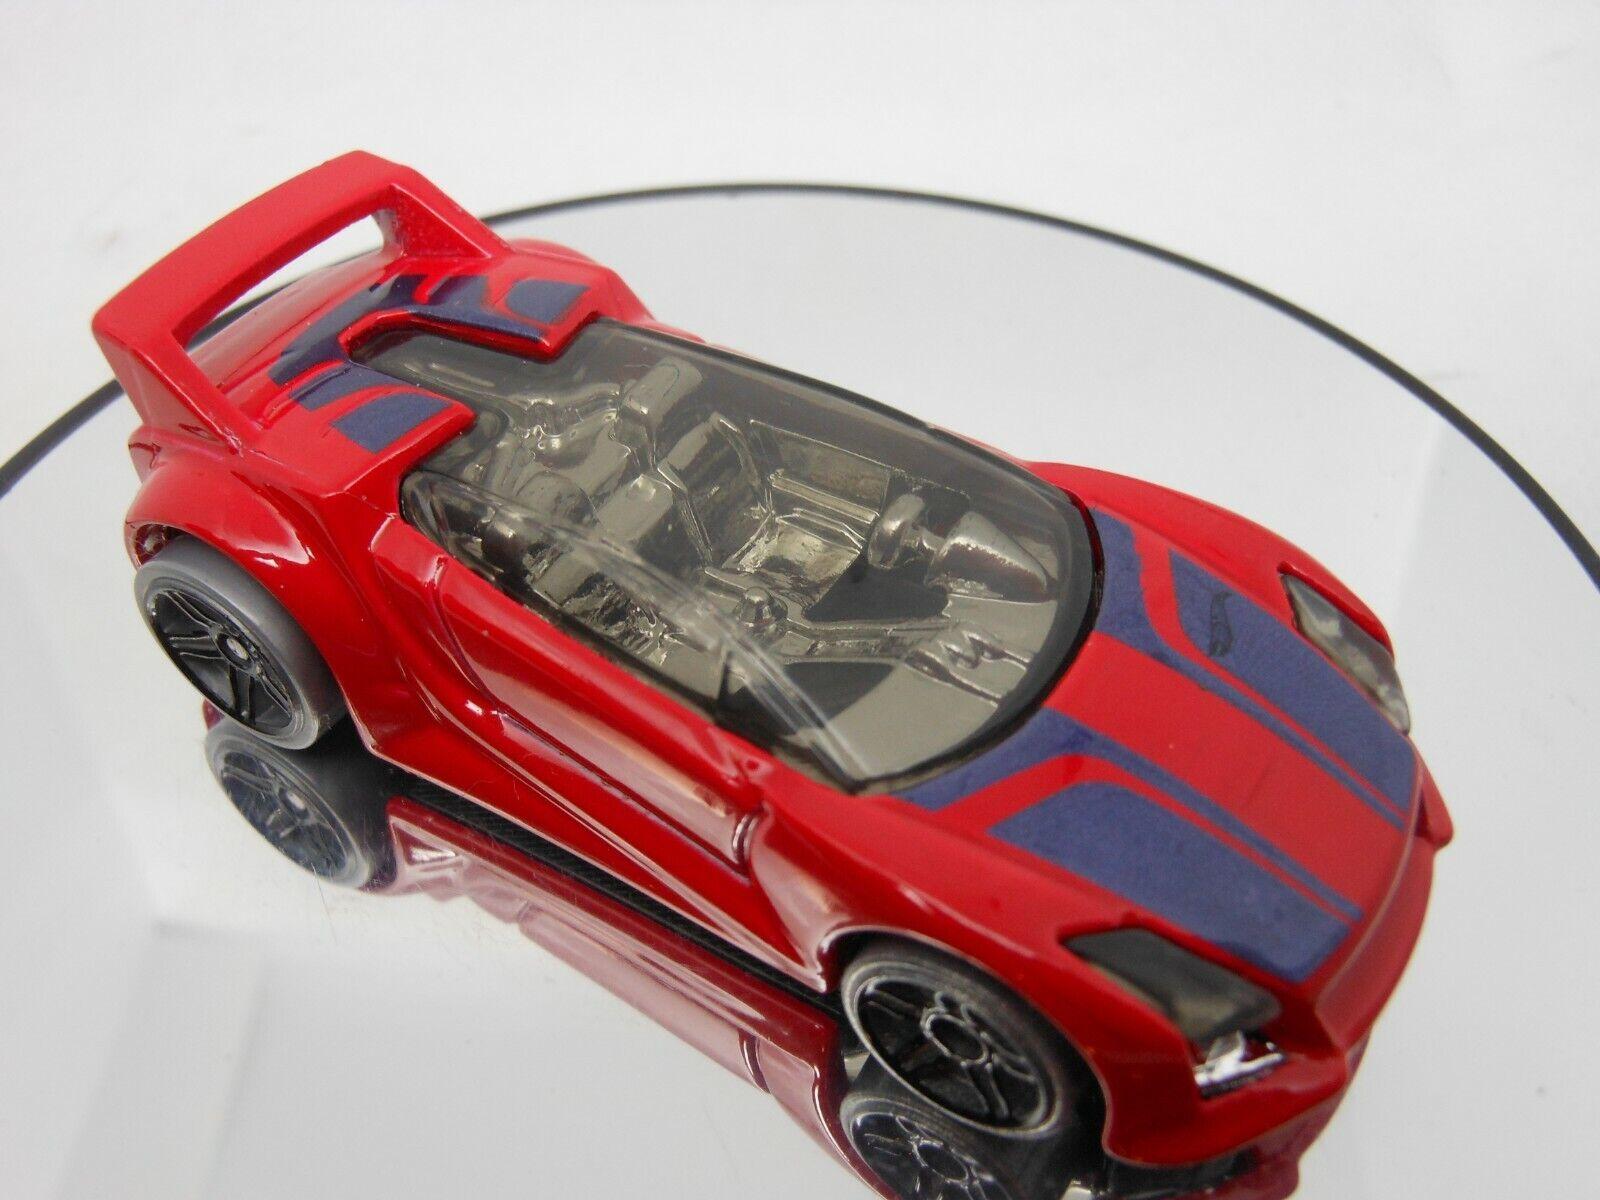 Hot Wheels New For 2013 HW City Nightburnerz Series  Quick N/' Sik  Red w// PR5s